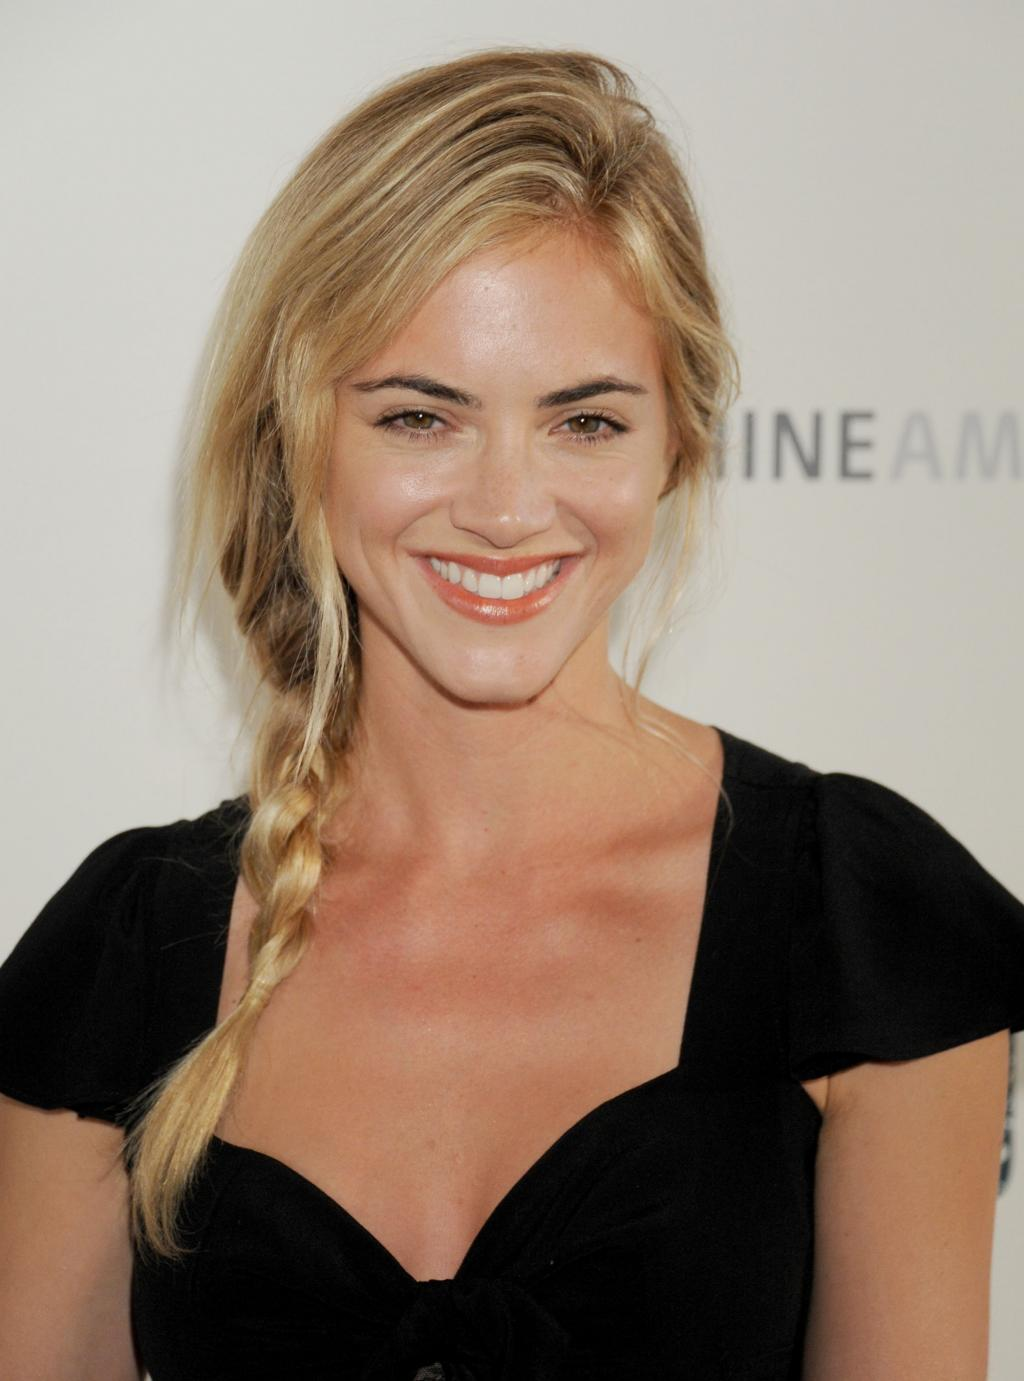 NCIS': Emily Wickersham Cast As Ziva's Successor, Bishop